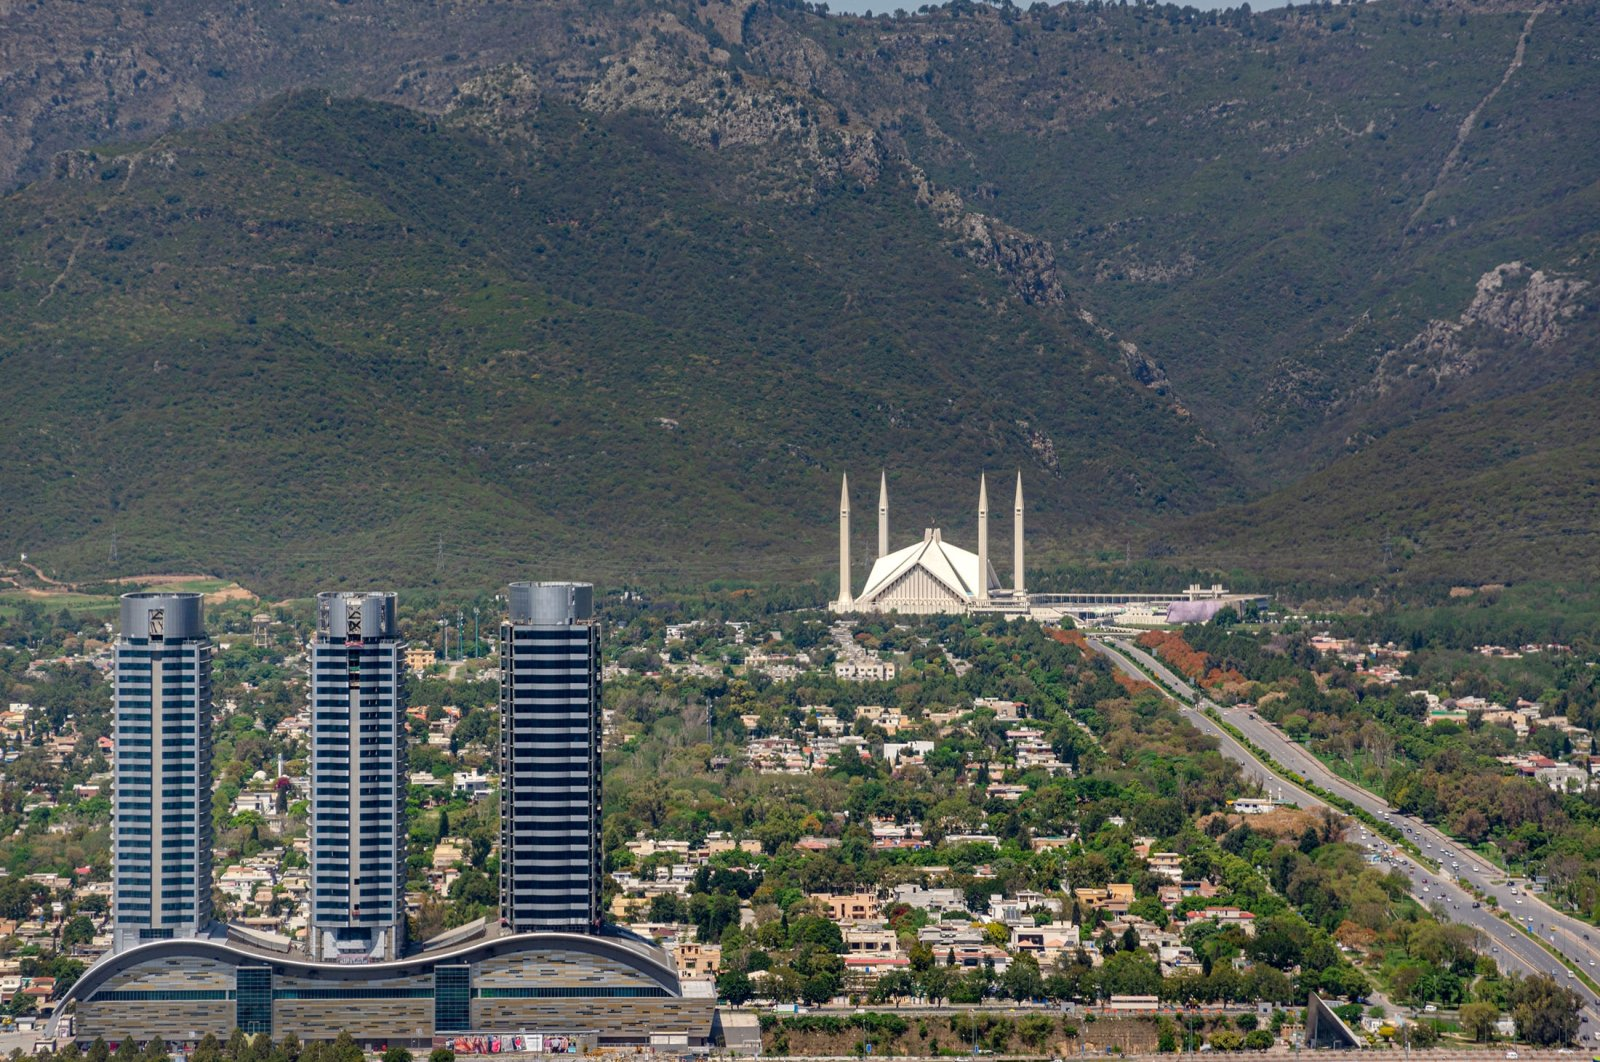 General view of Pakistan's capital Islamabad. (Shutterstock Photo)